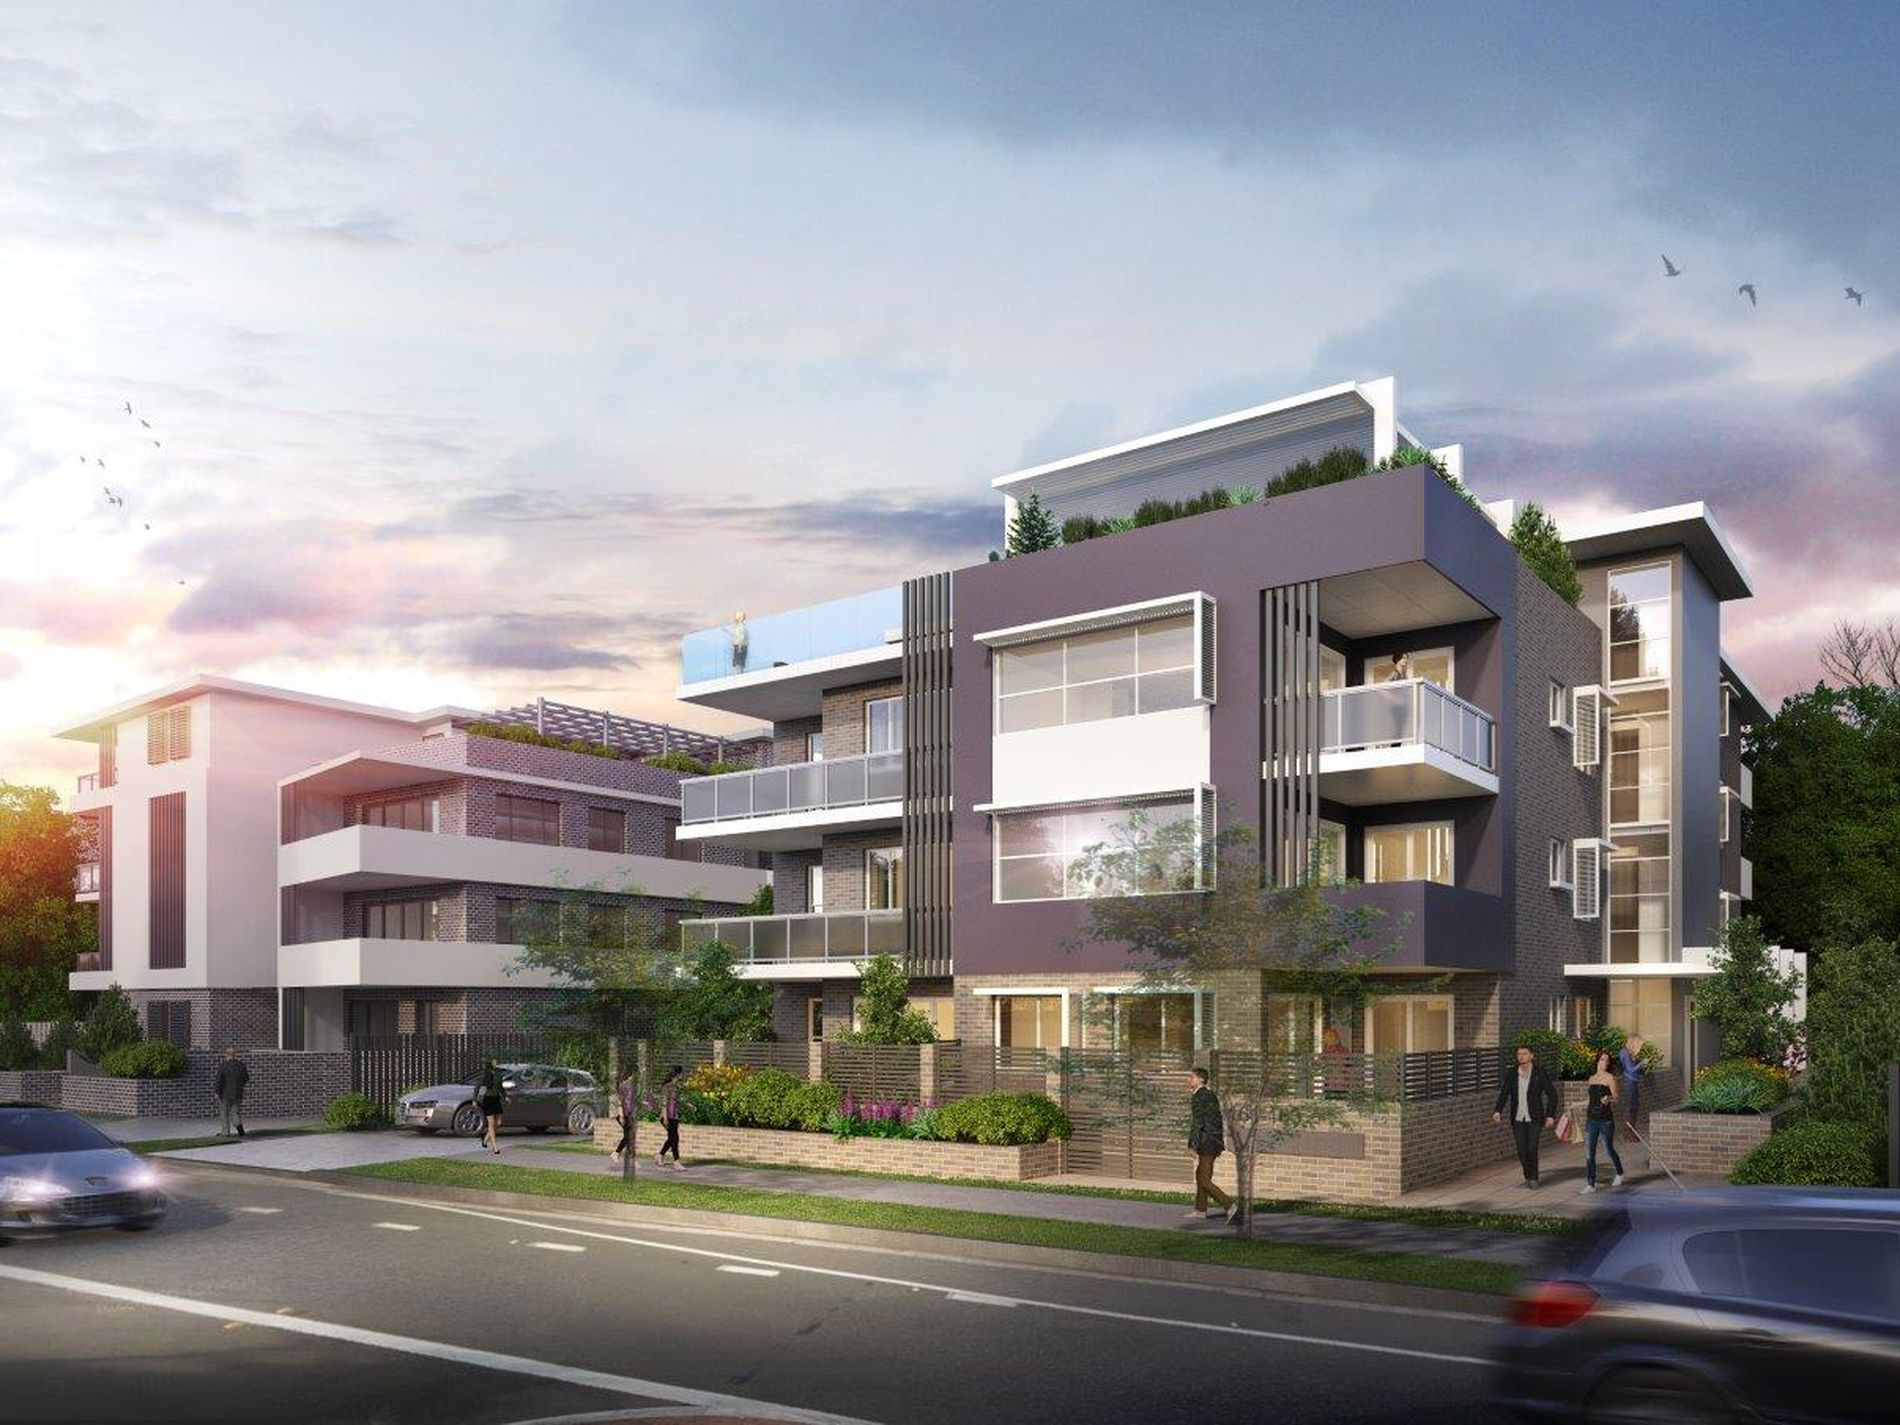 161 - 163 Pennant Street, Parramatta